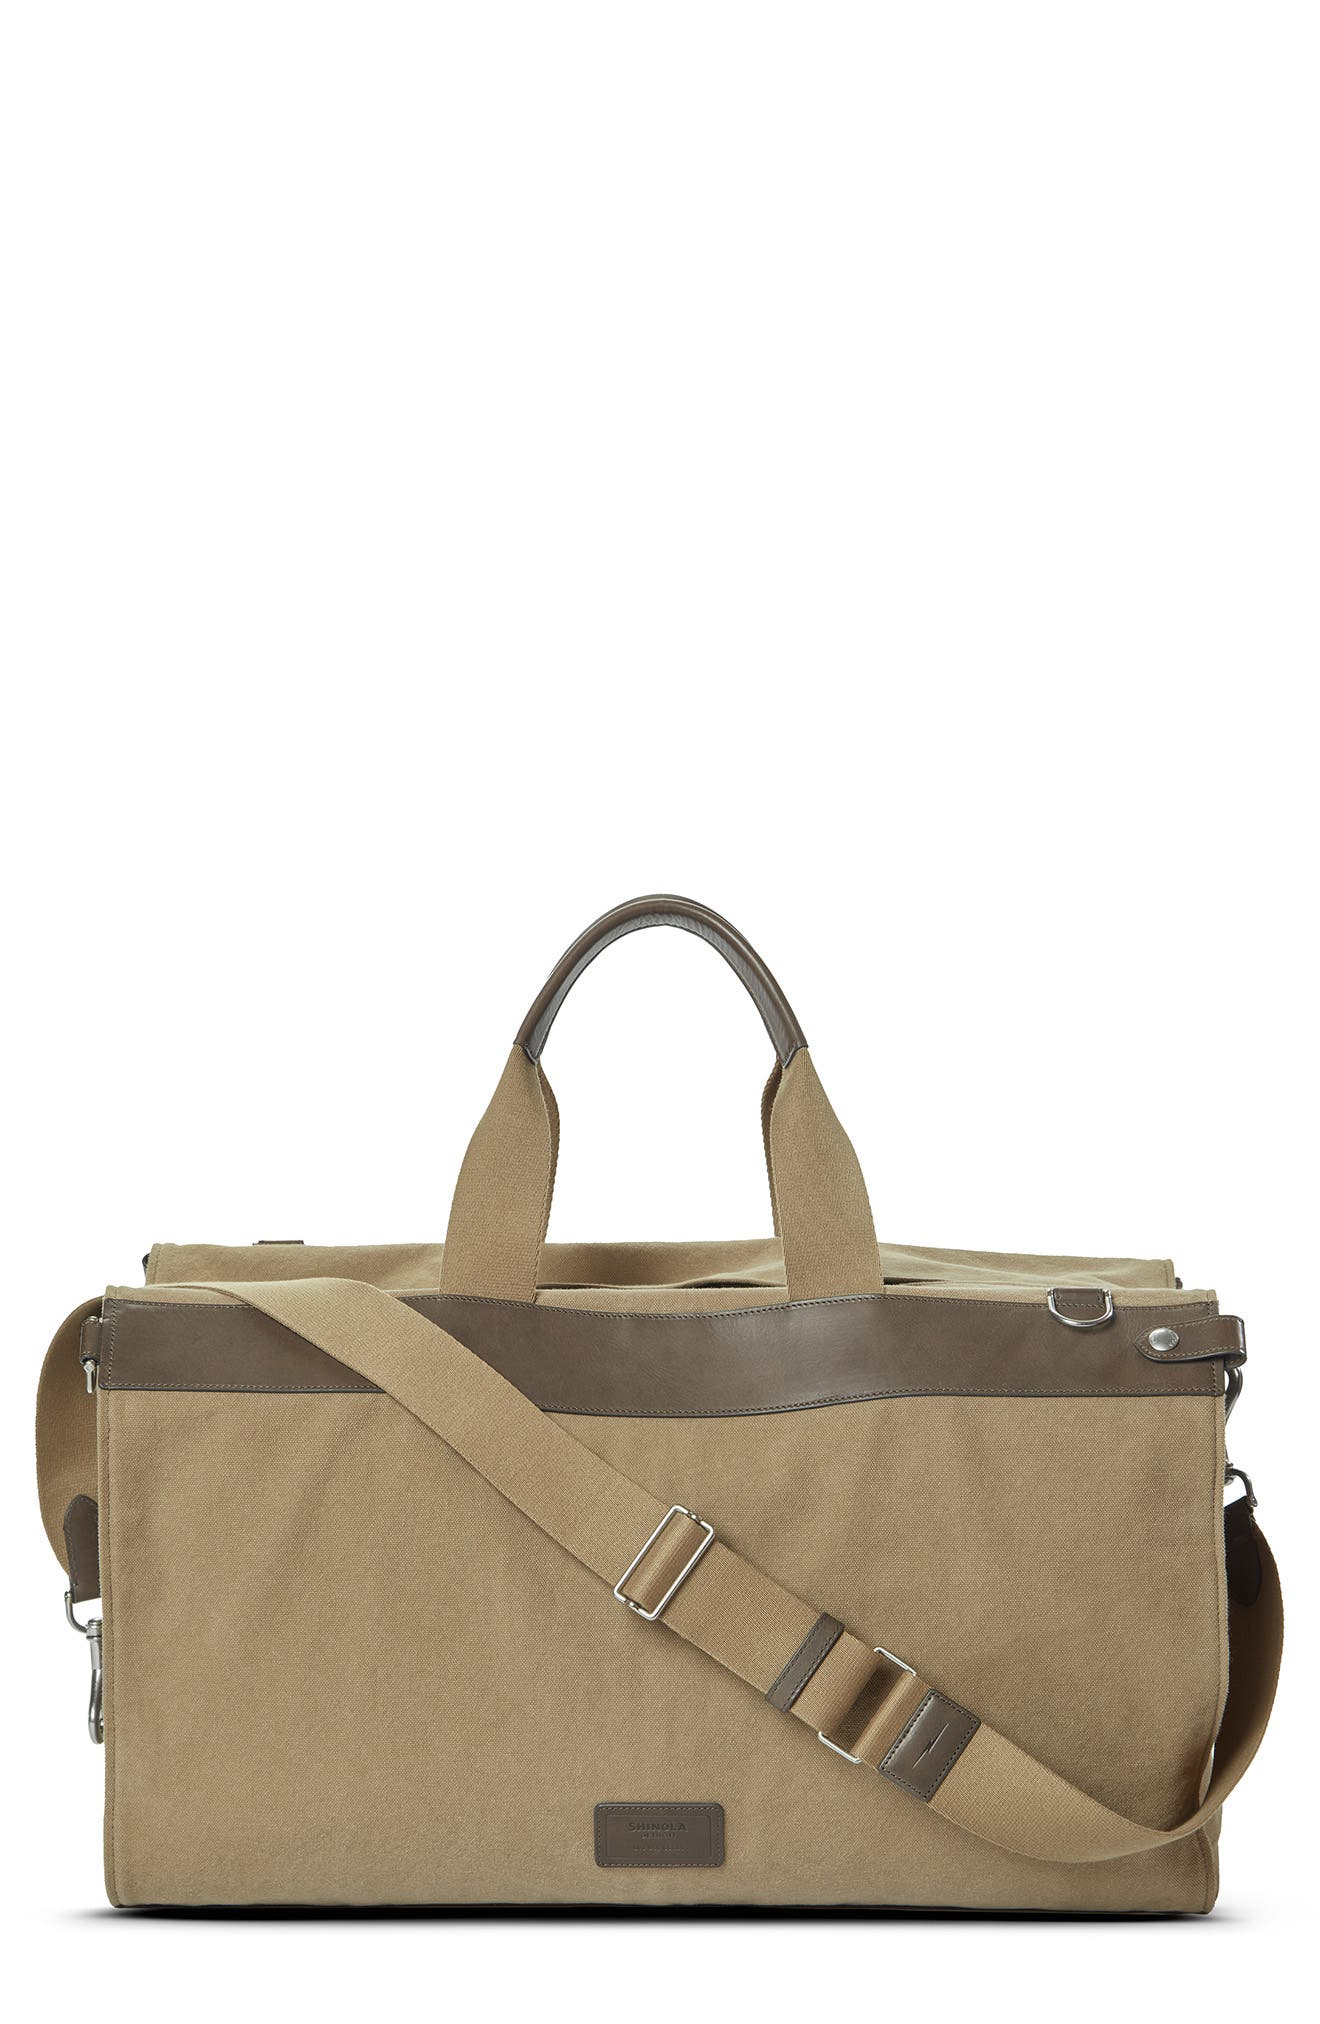 The Convertible Traveler Garment Canvas Bag